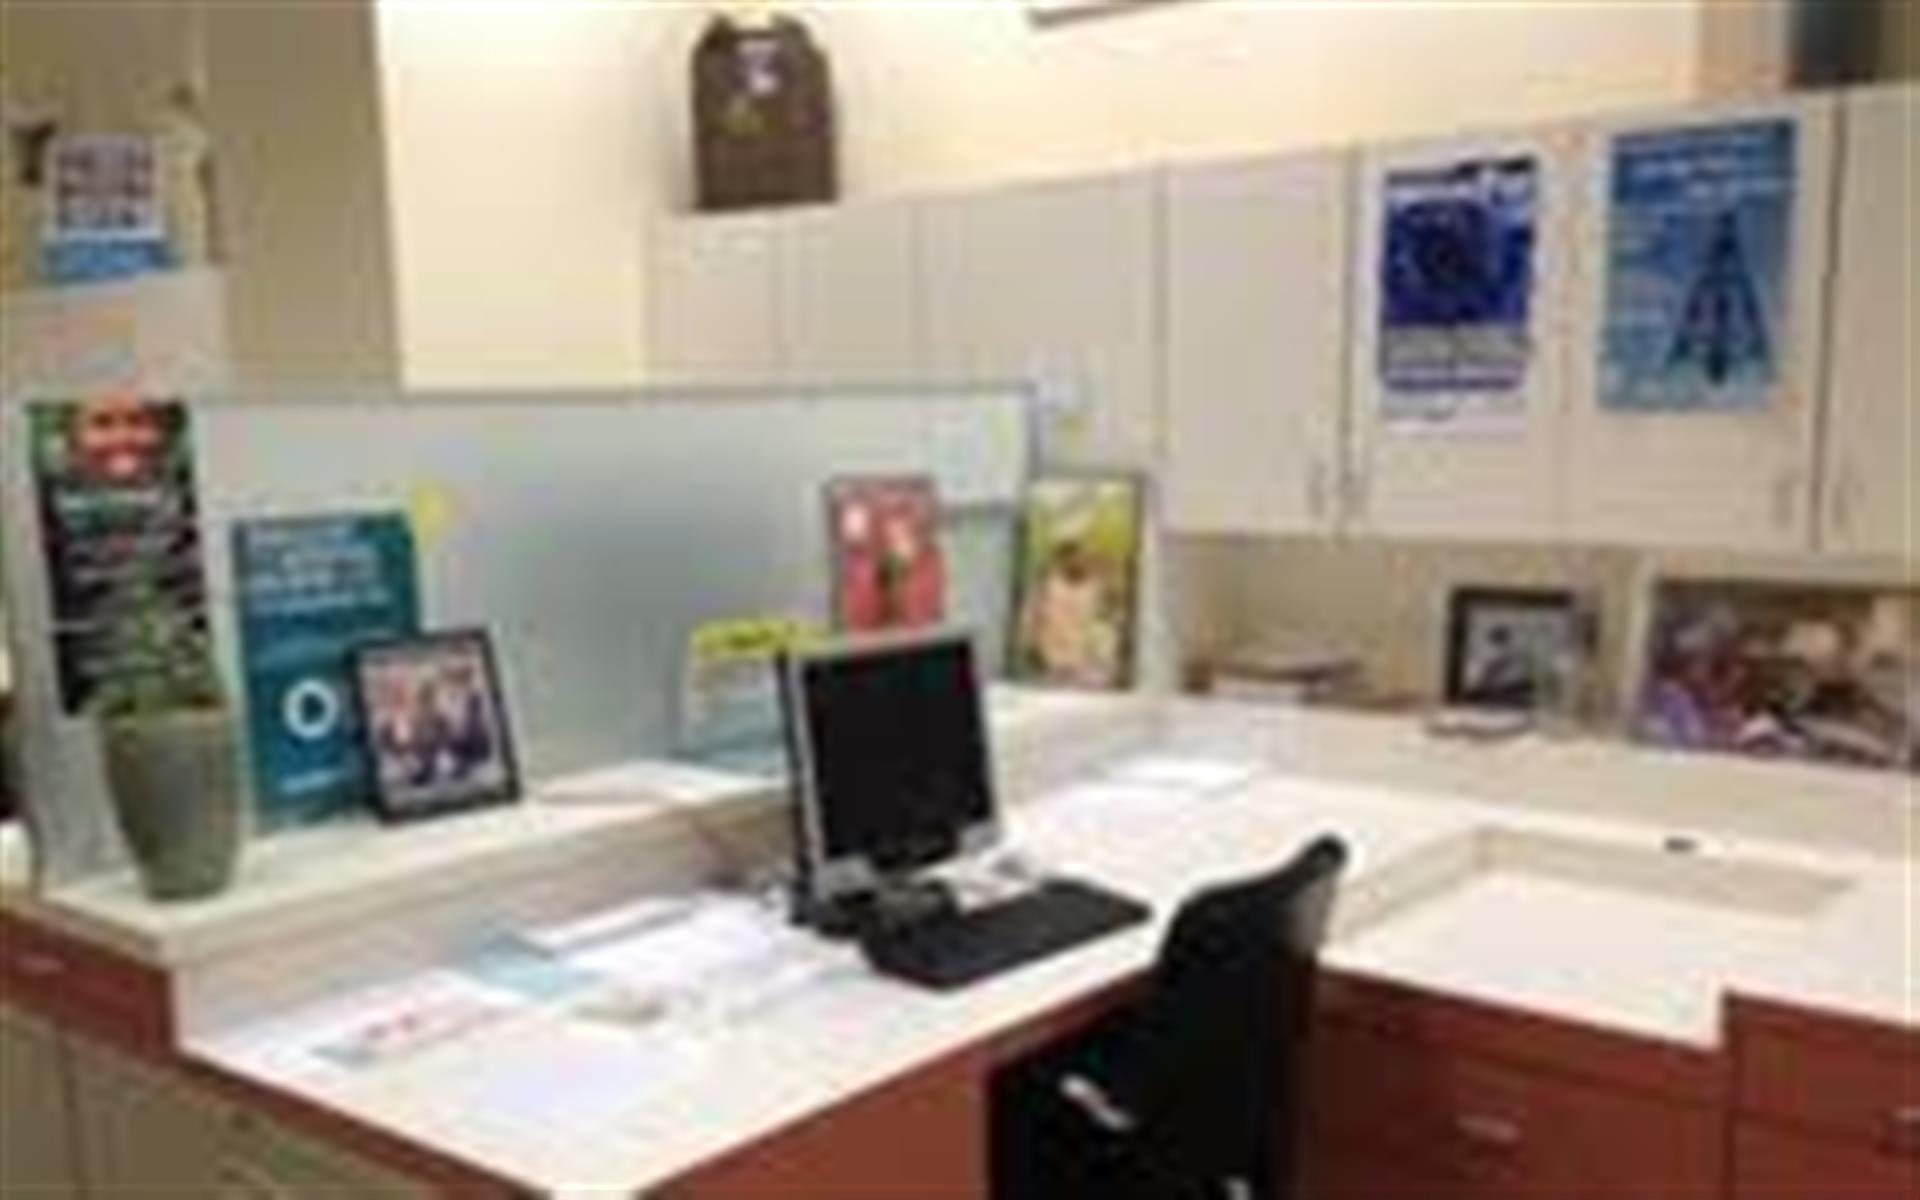 Share Space, Cowork & Local Economy Center, Santa Rosa - Dedicated Desk